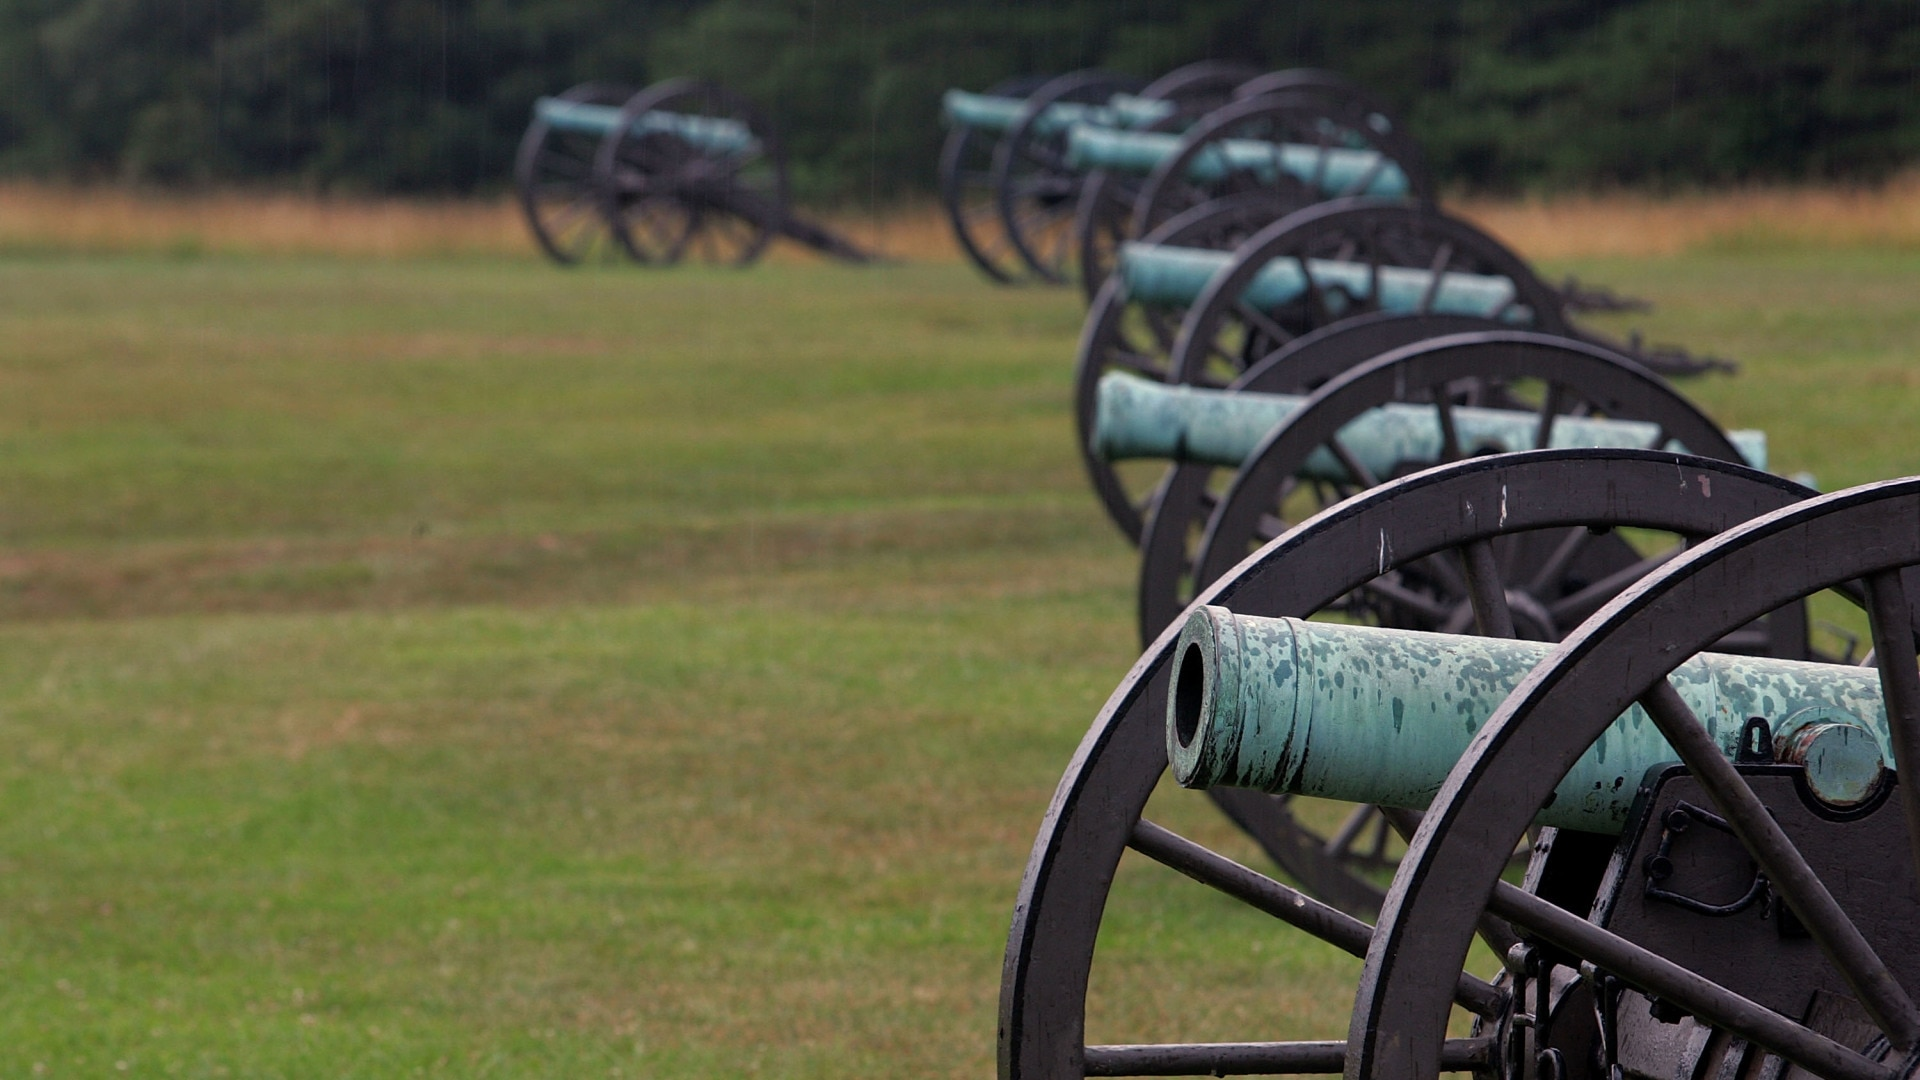 The Civil War: Antietam